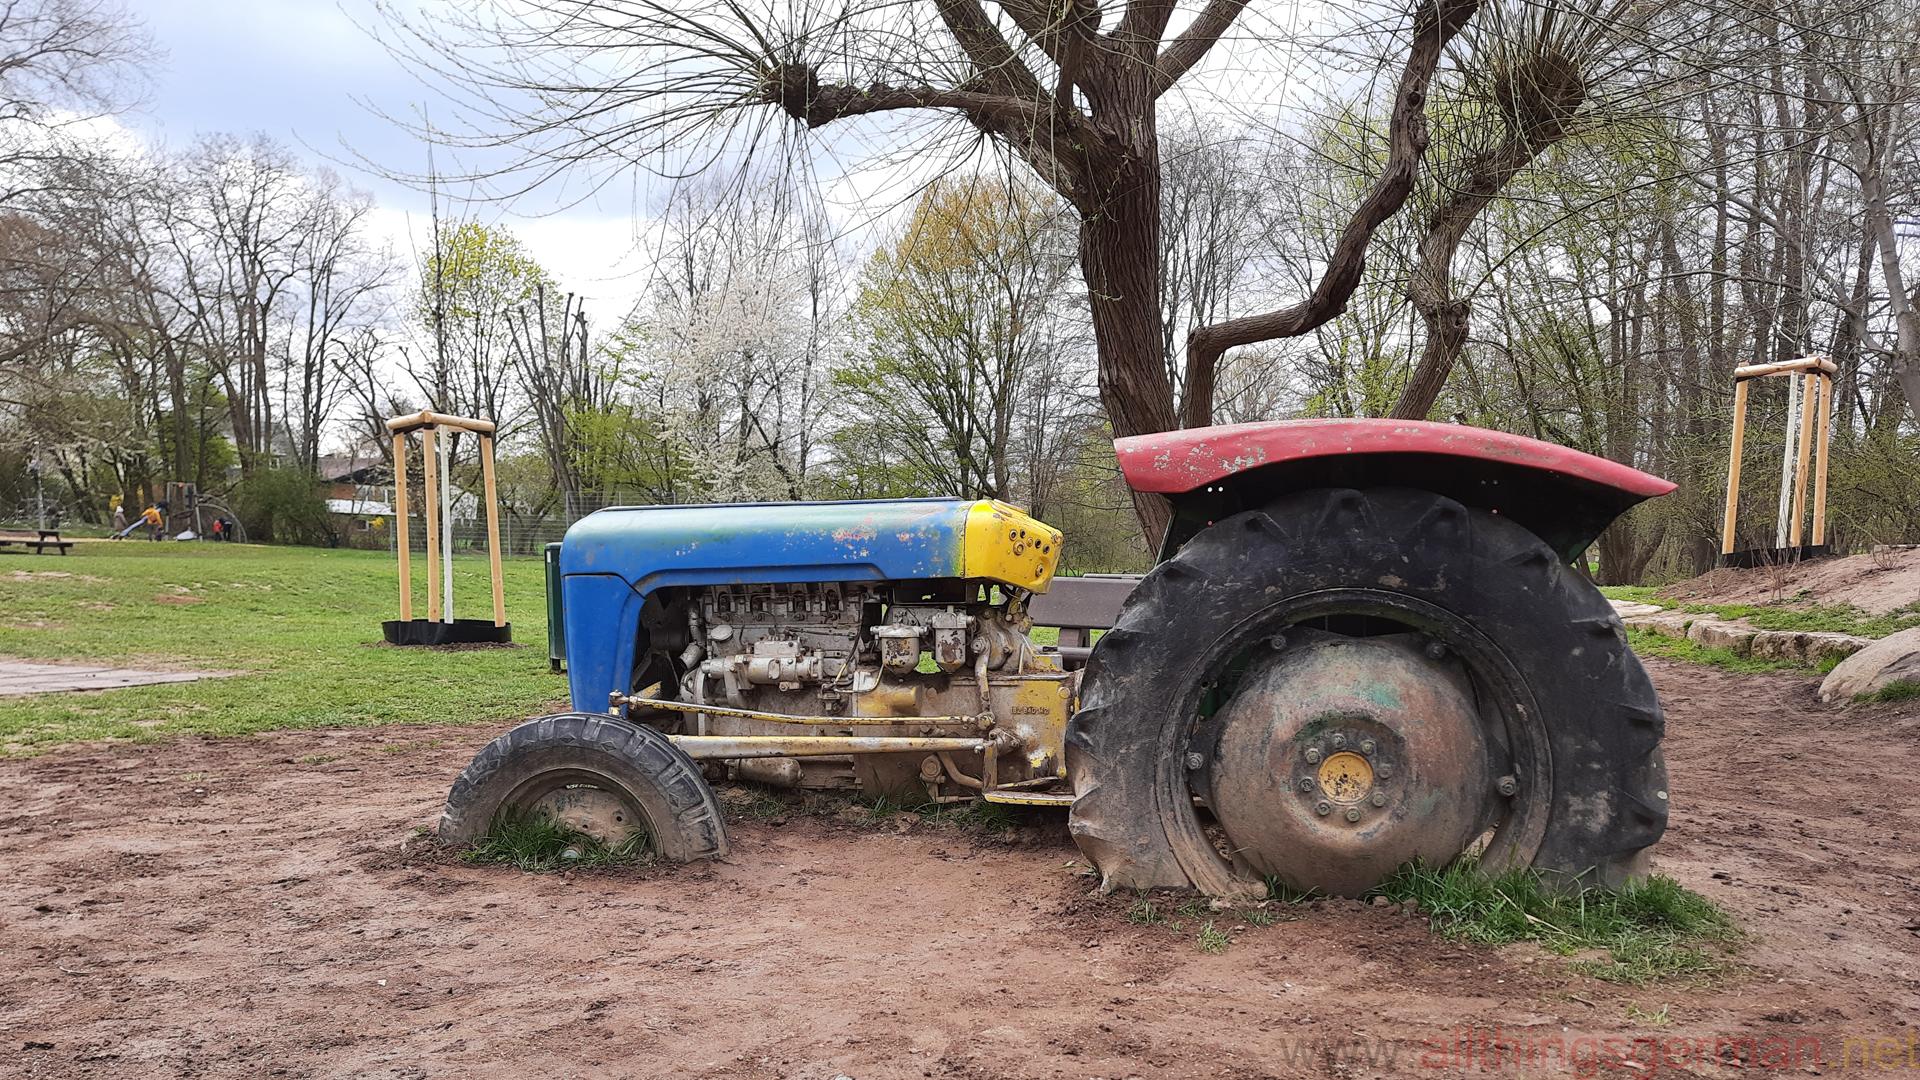 The tractor at the Traktorspielplatz in Niederhöchstadt